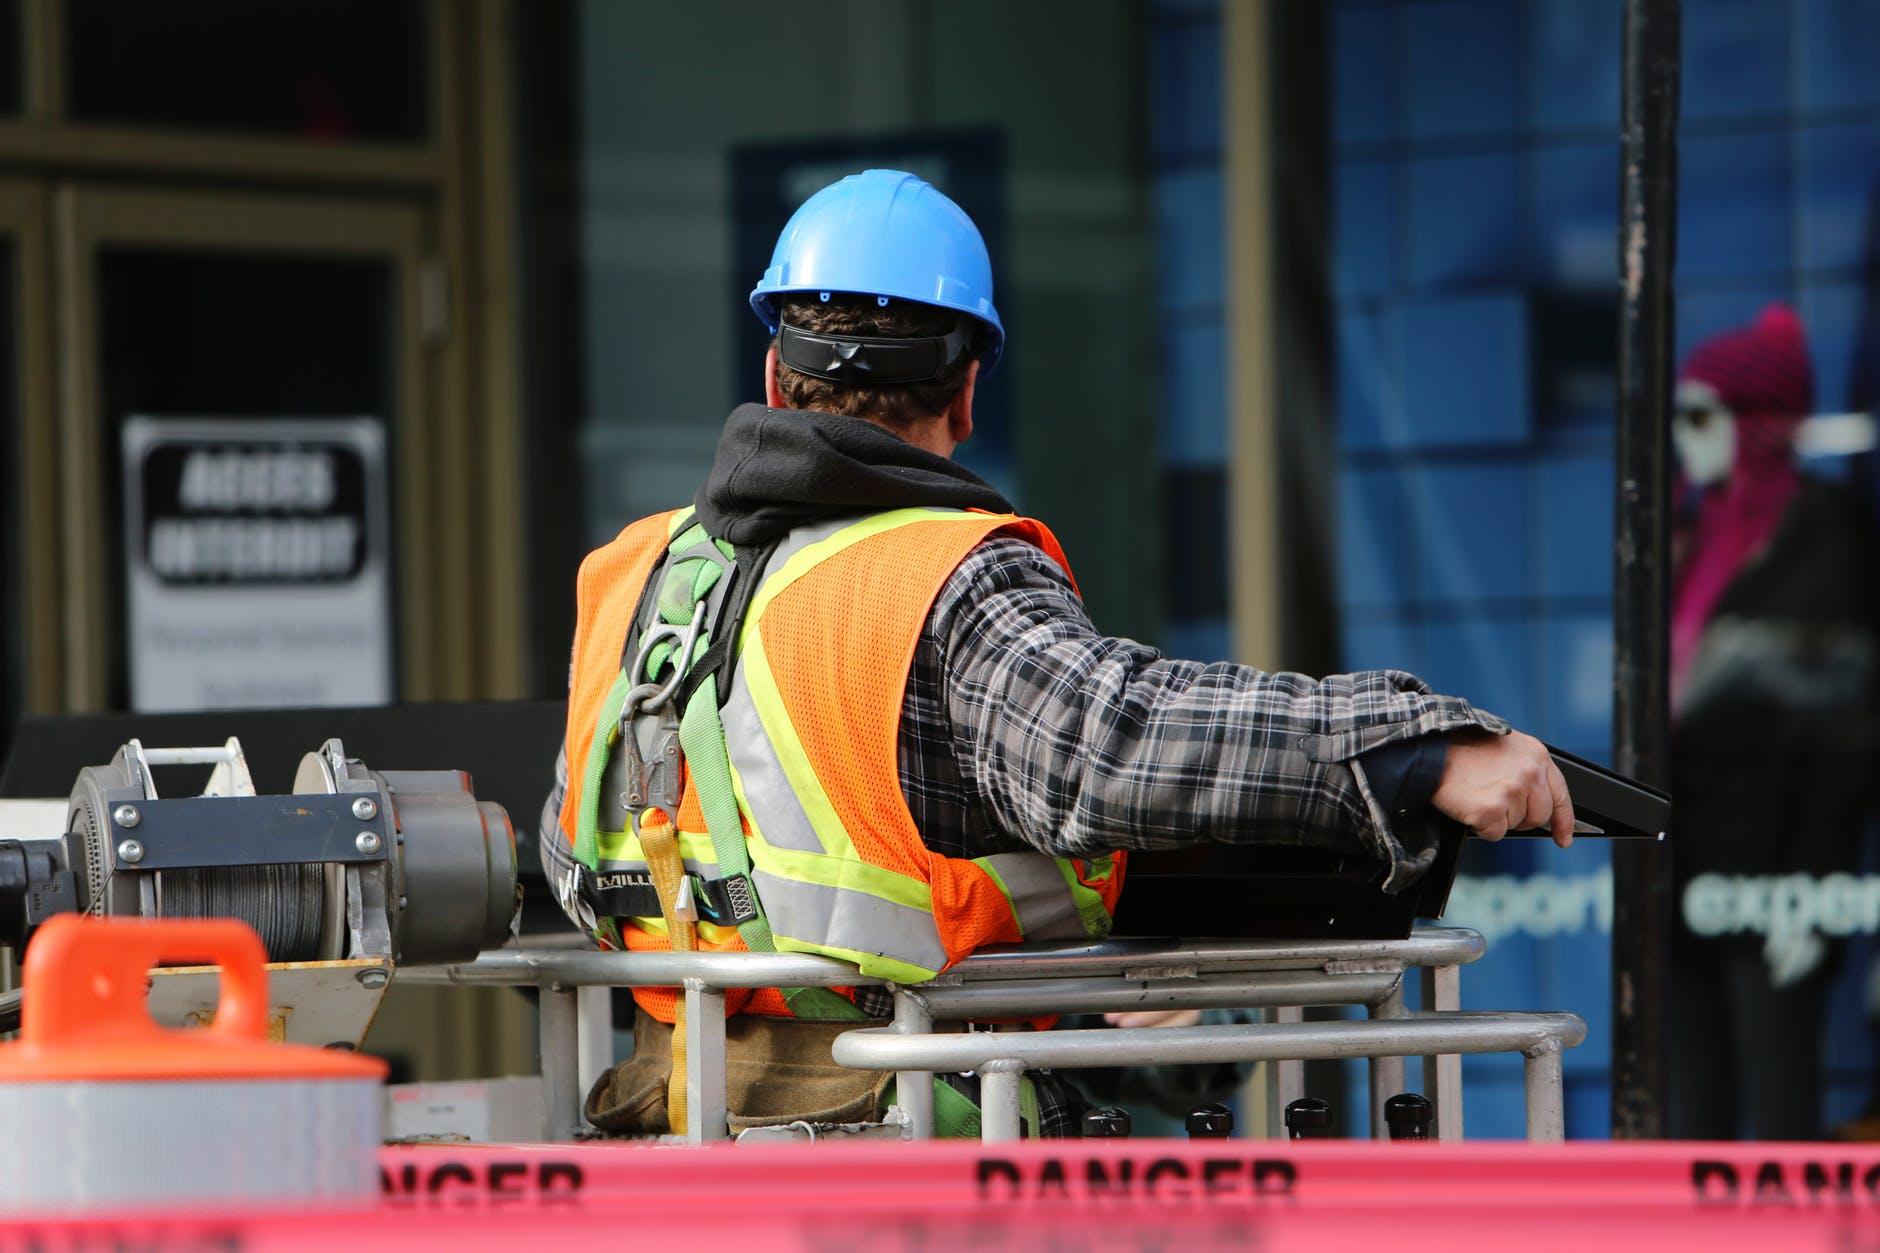 construction worker safety danger